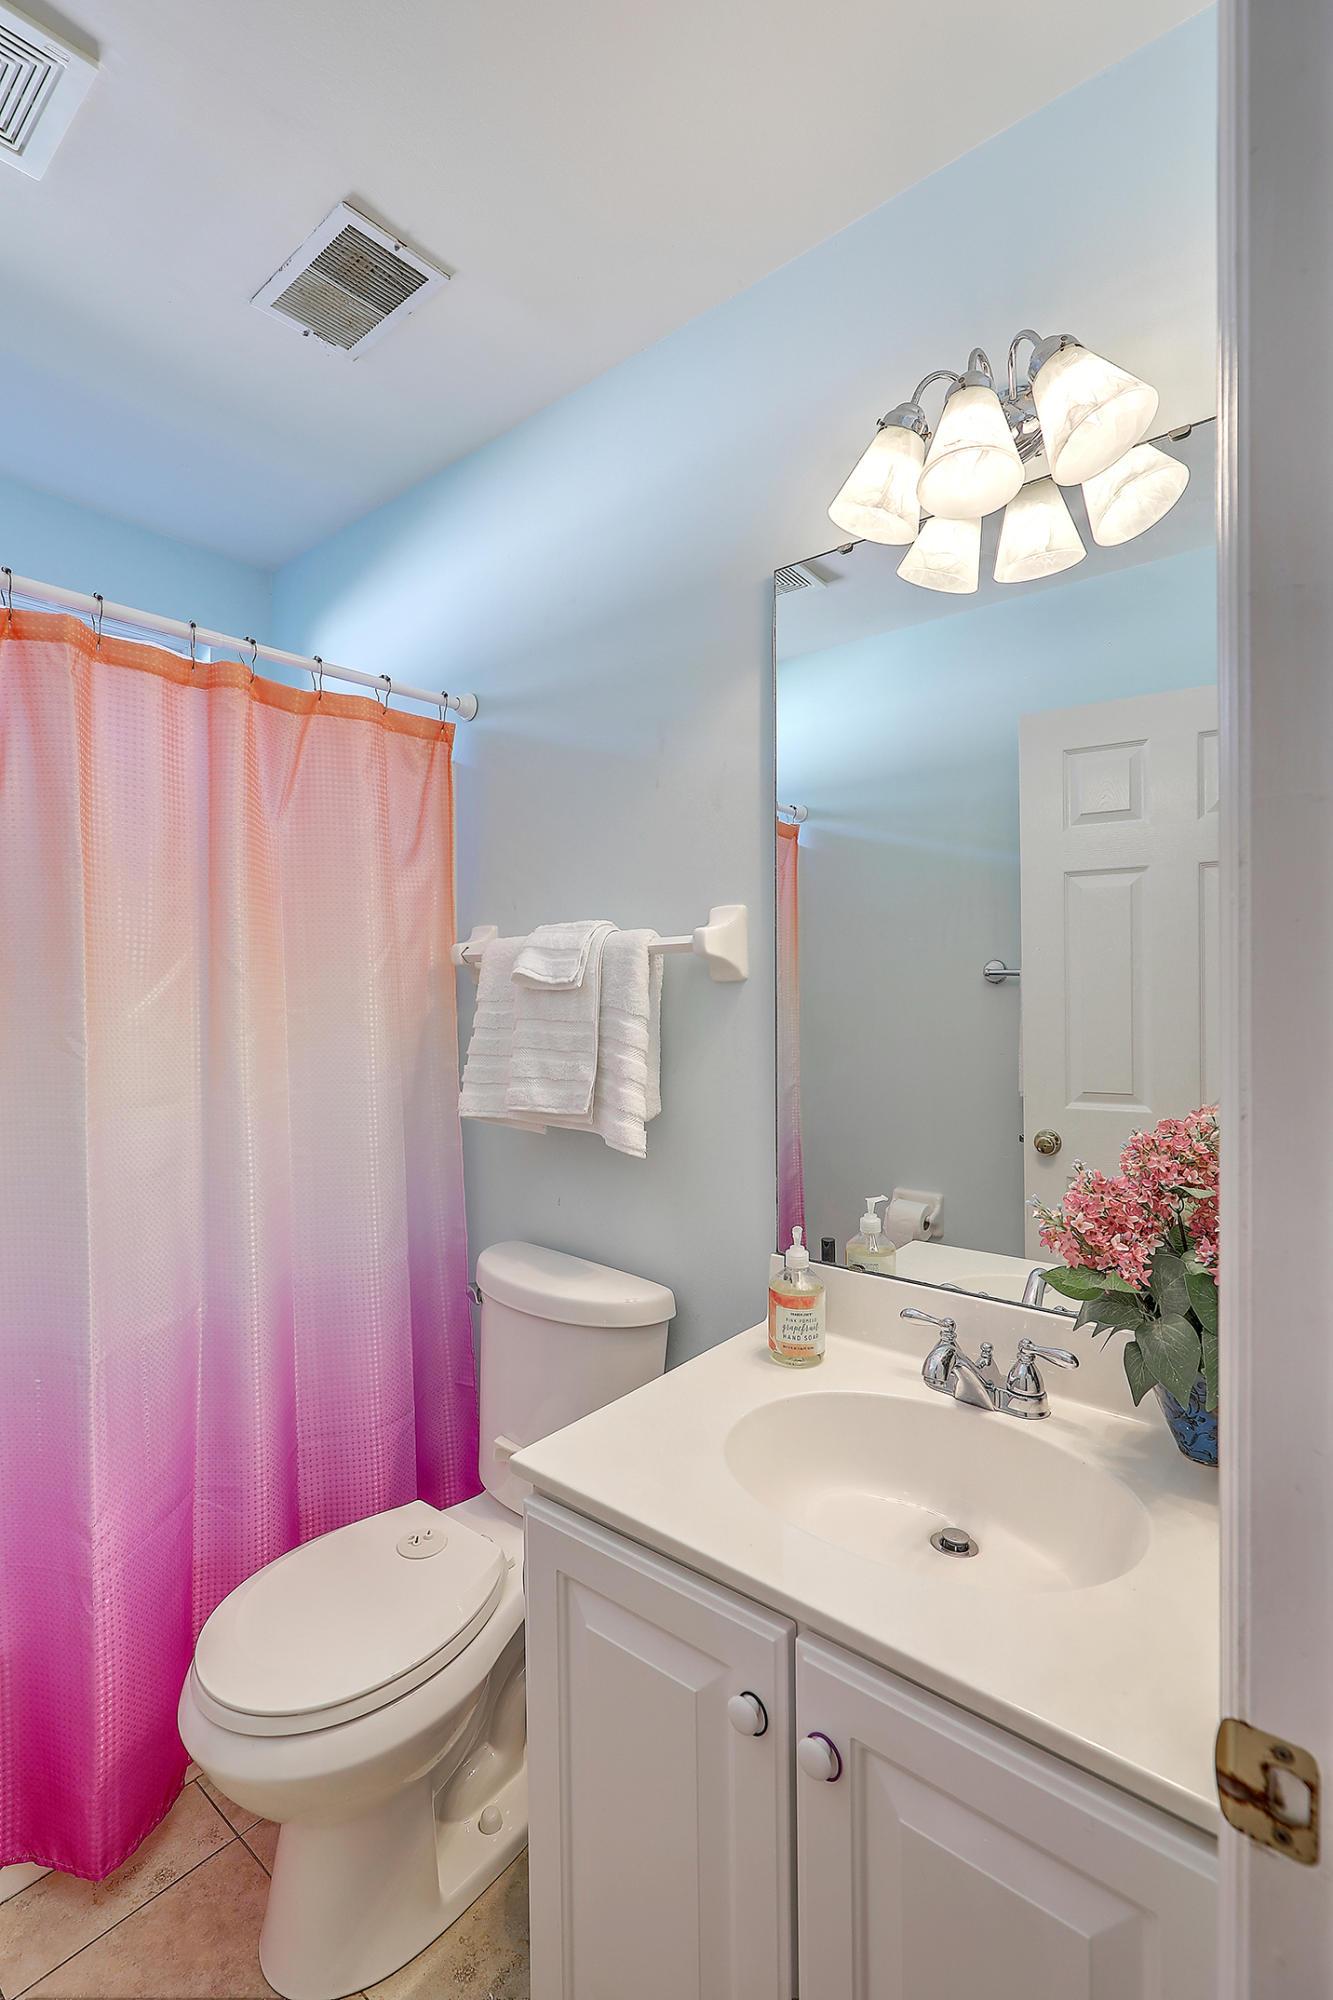 Dunes West Homes For Sale - 1471 Cypress Pointe, Mount Pleasant, SC - 37